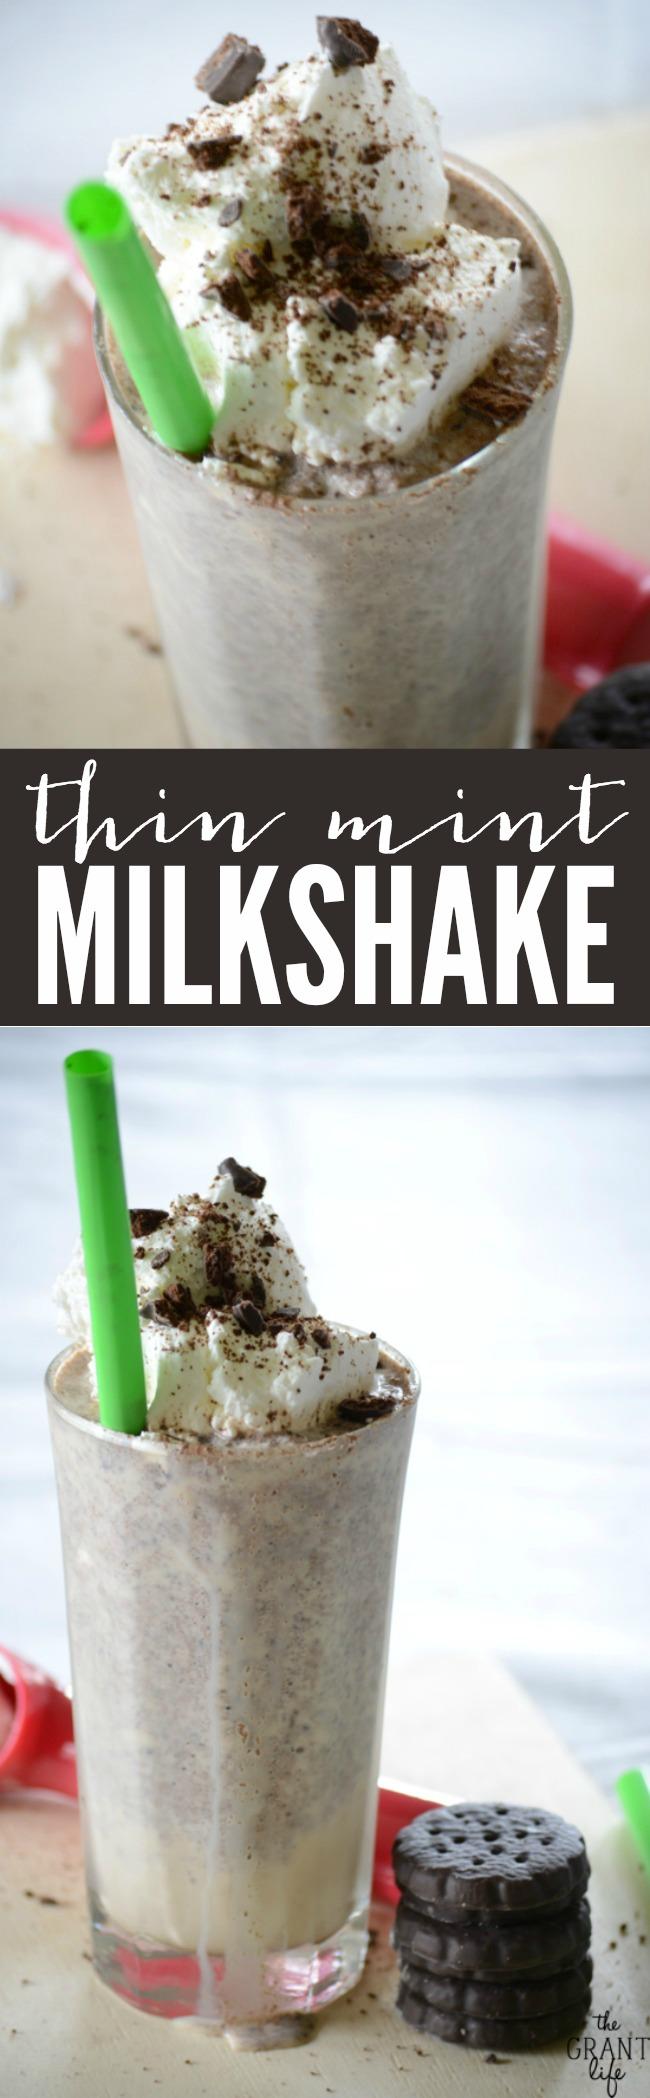 Thin Mint Milkshake | anightowlblog.com